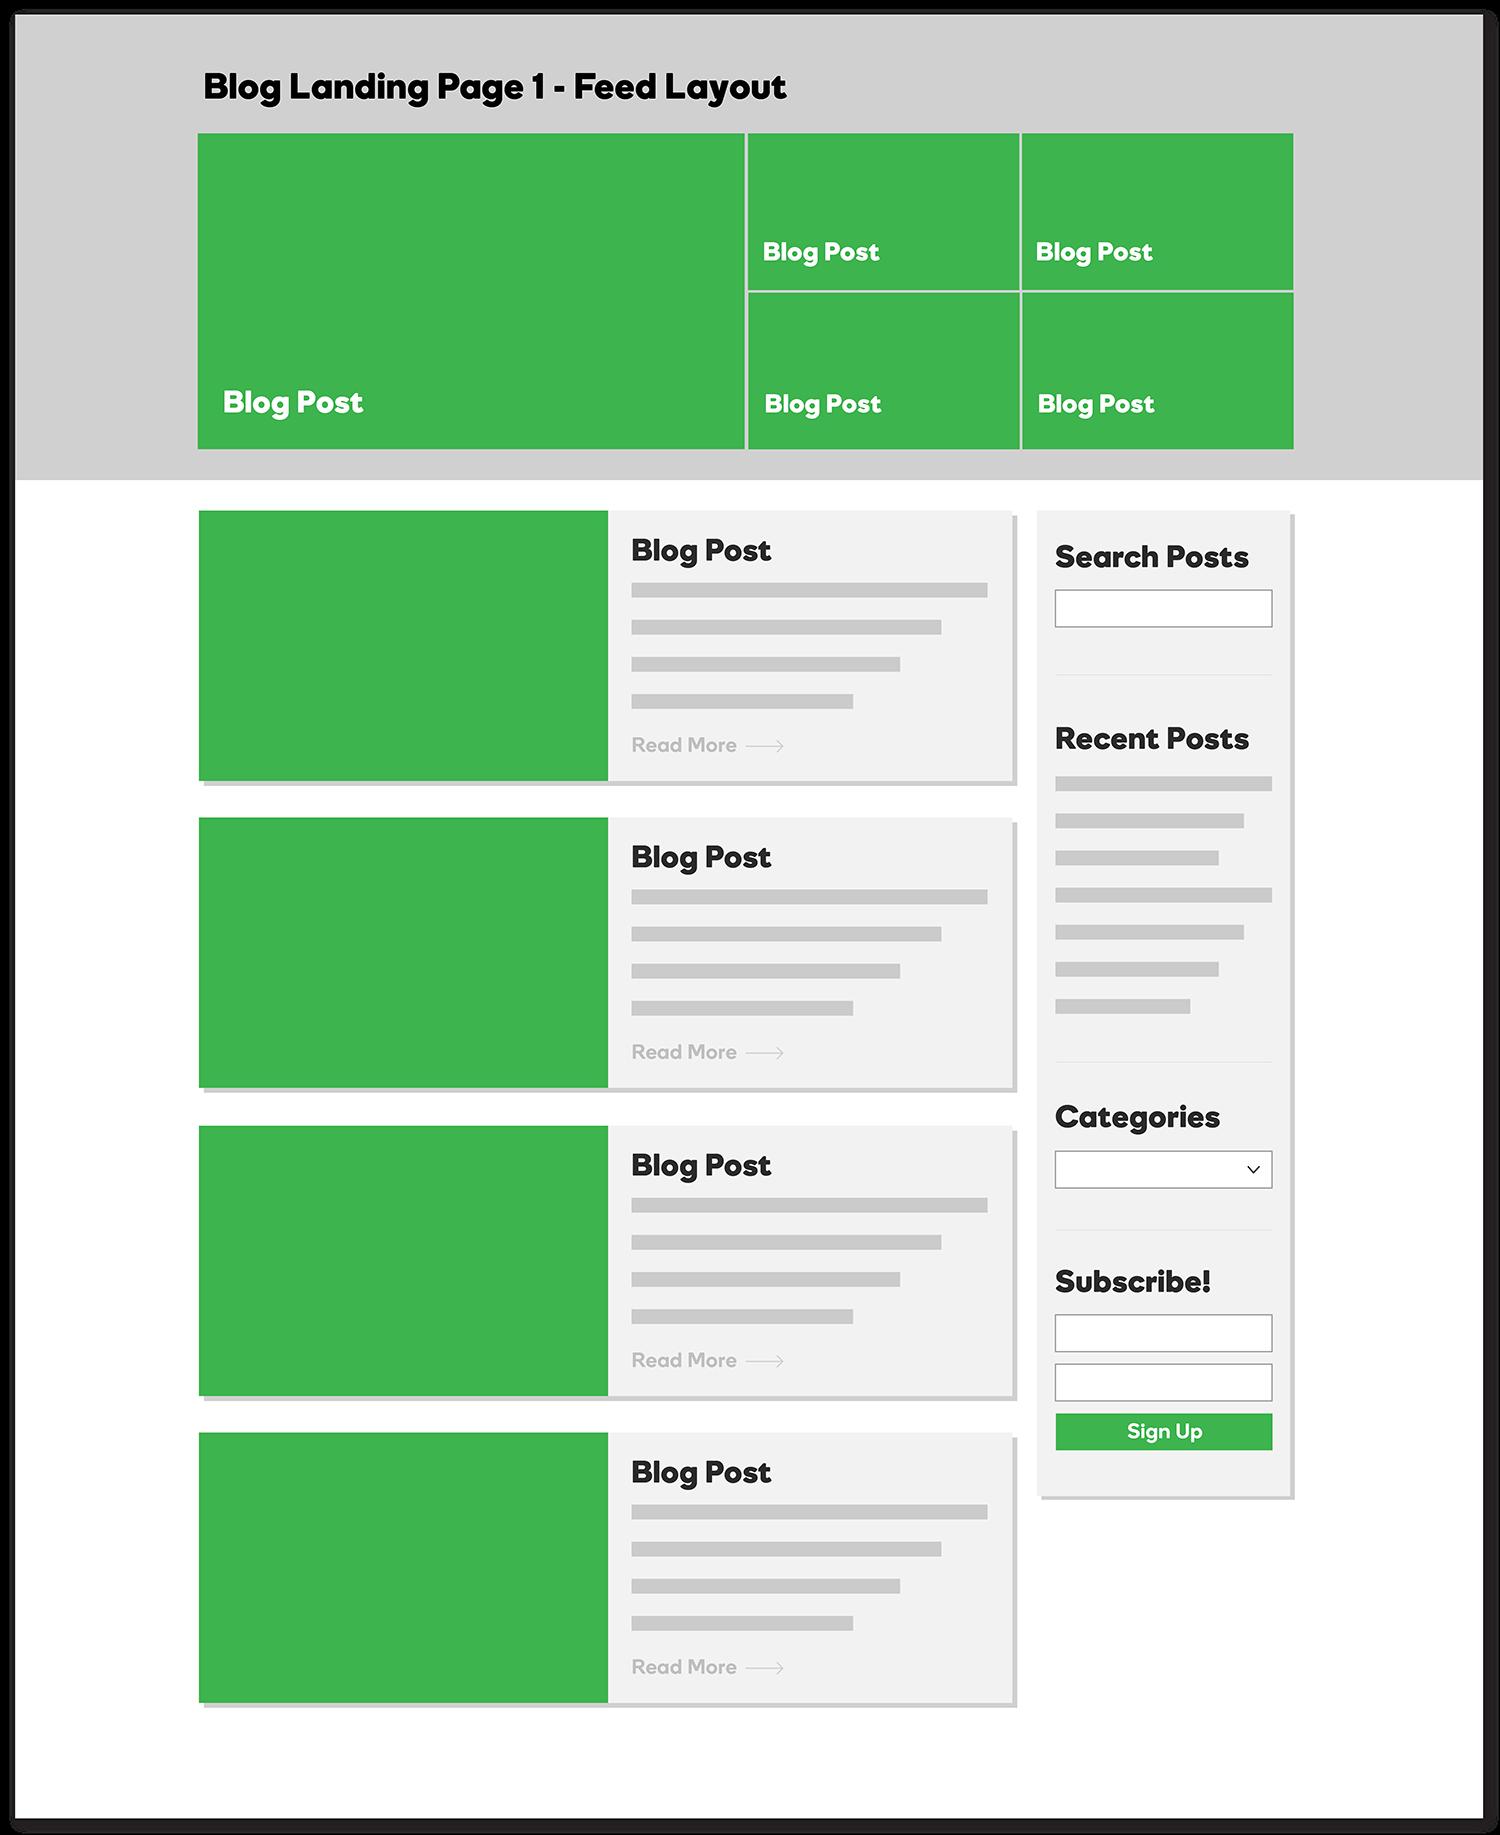 Blog Landing Page - Feed